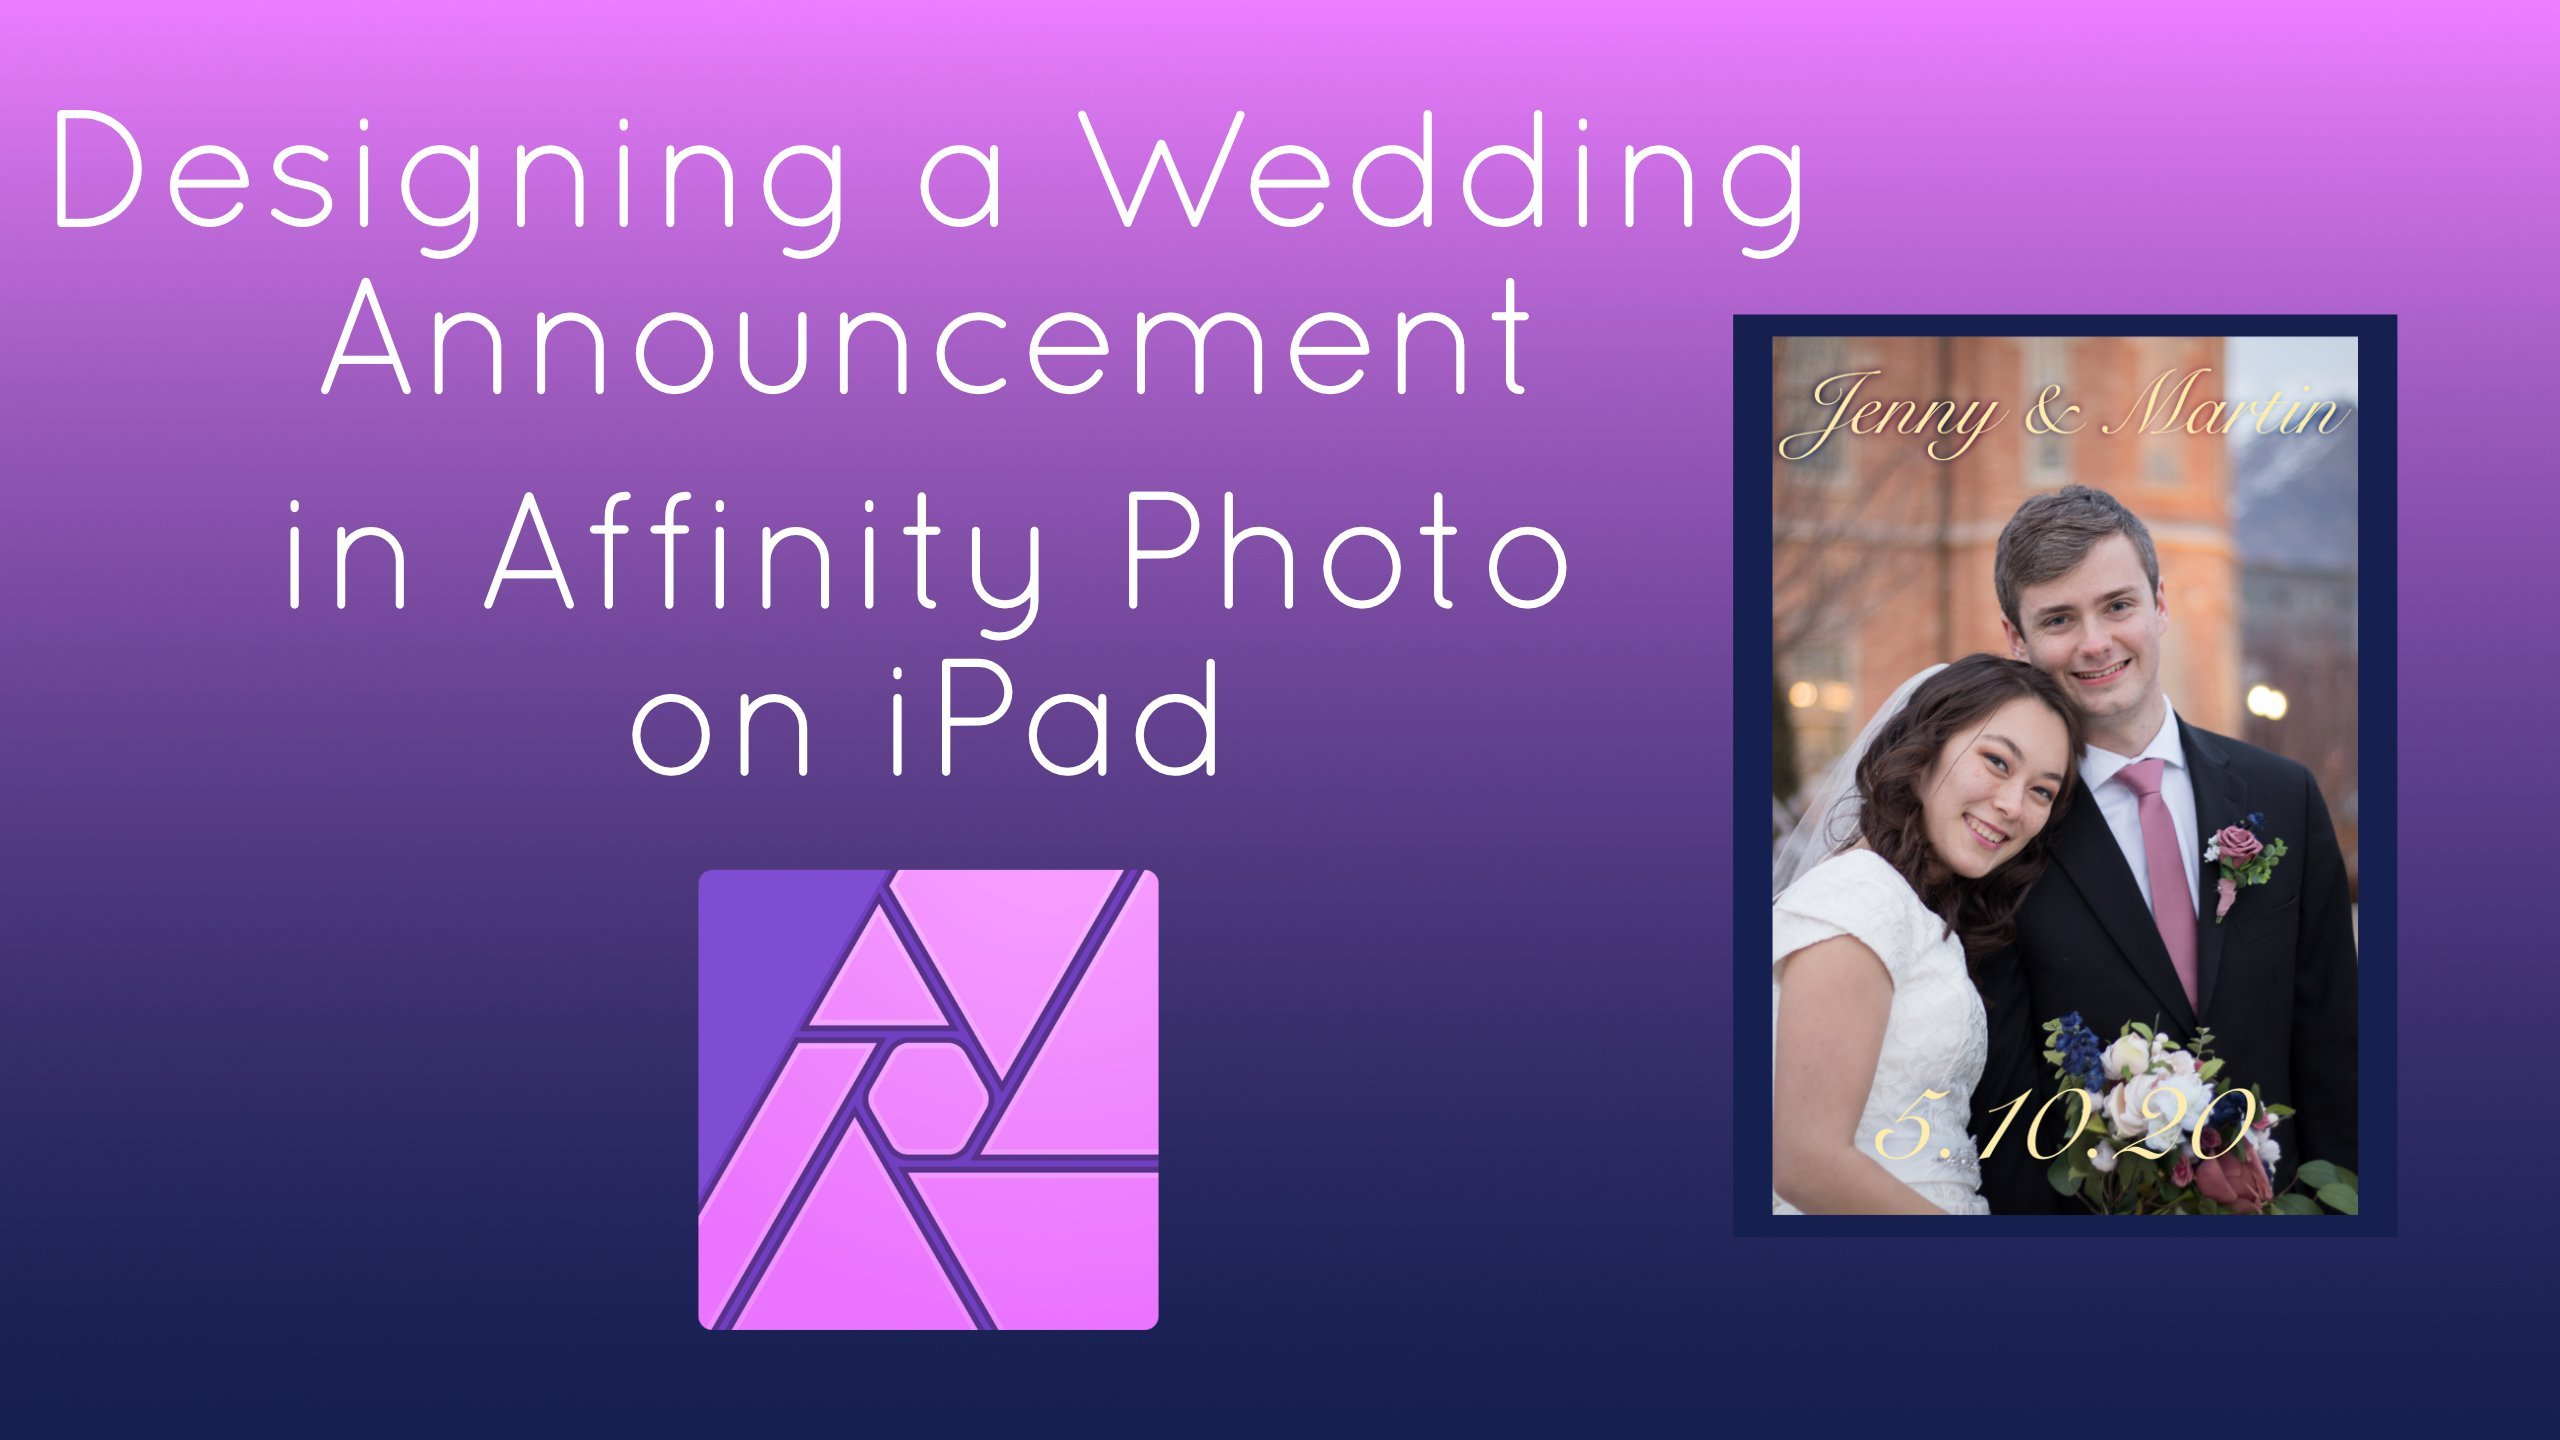 Designing Wedding Invitations in Affinity Photo on iPad